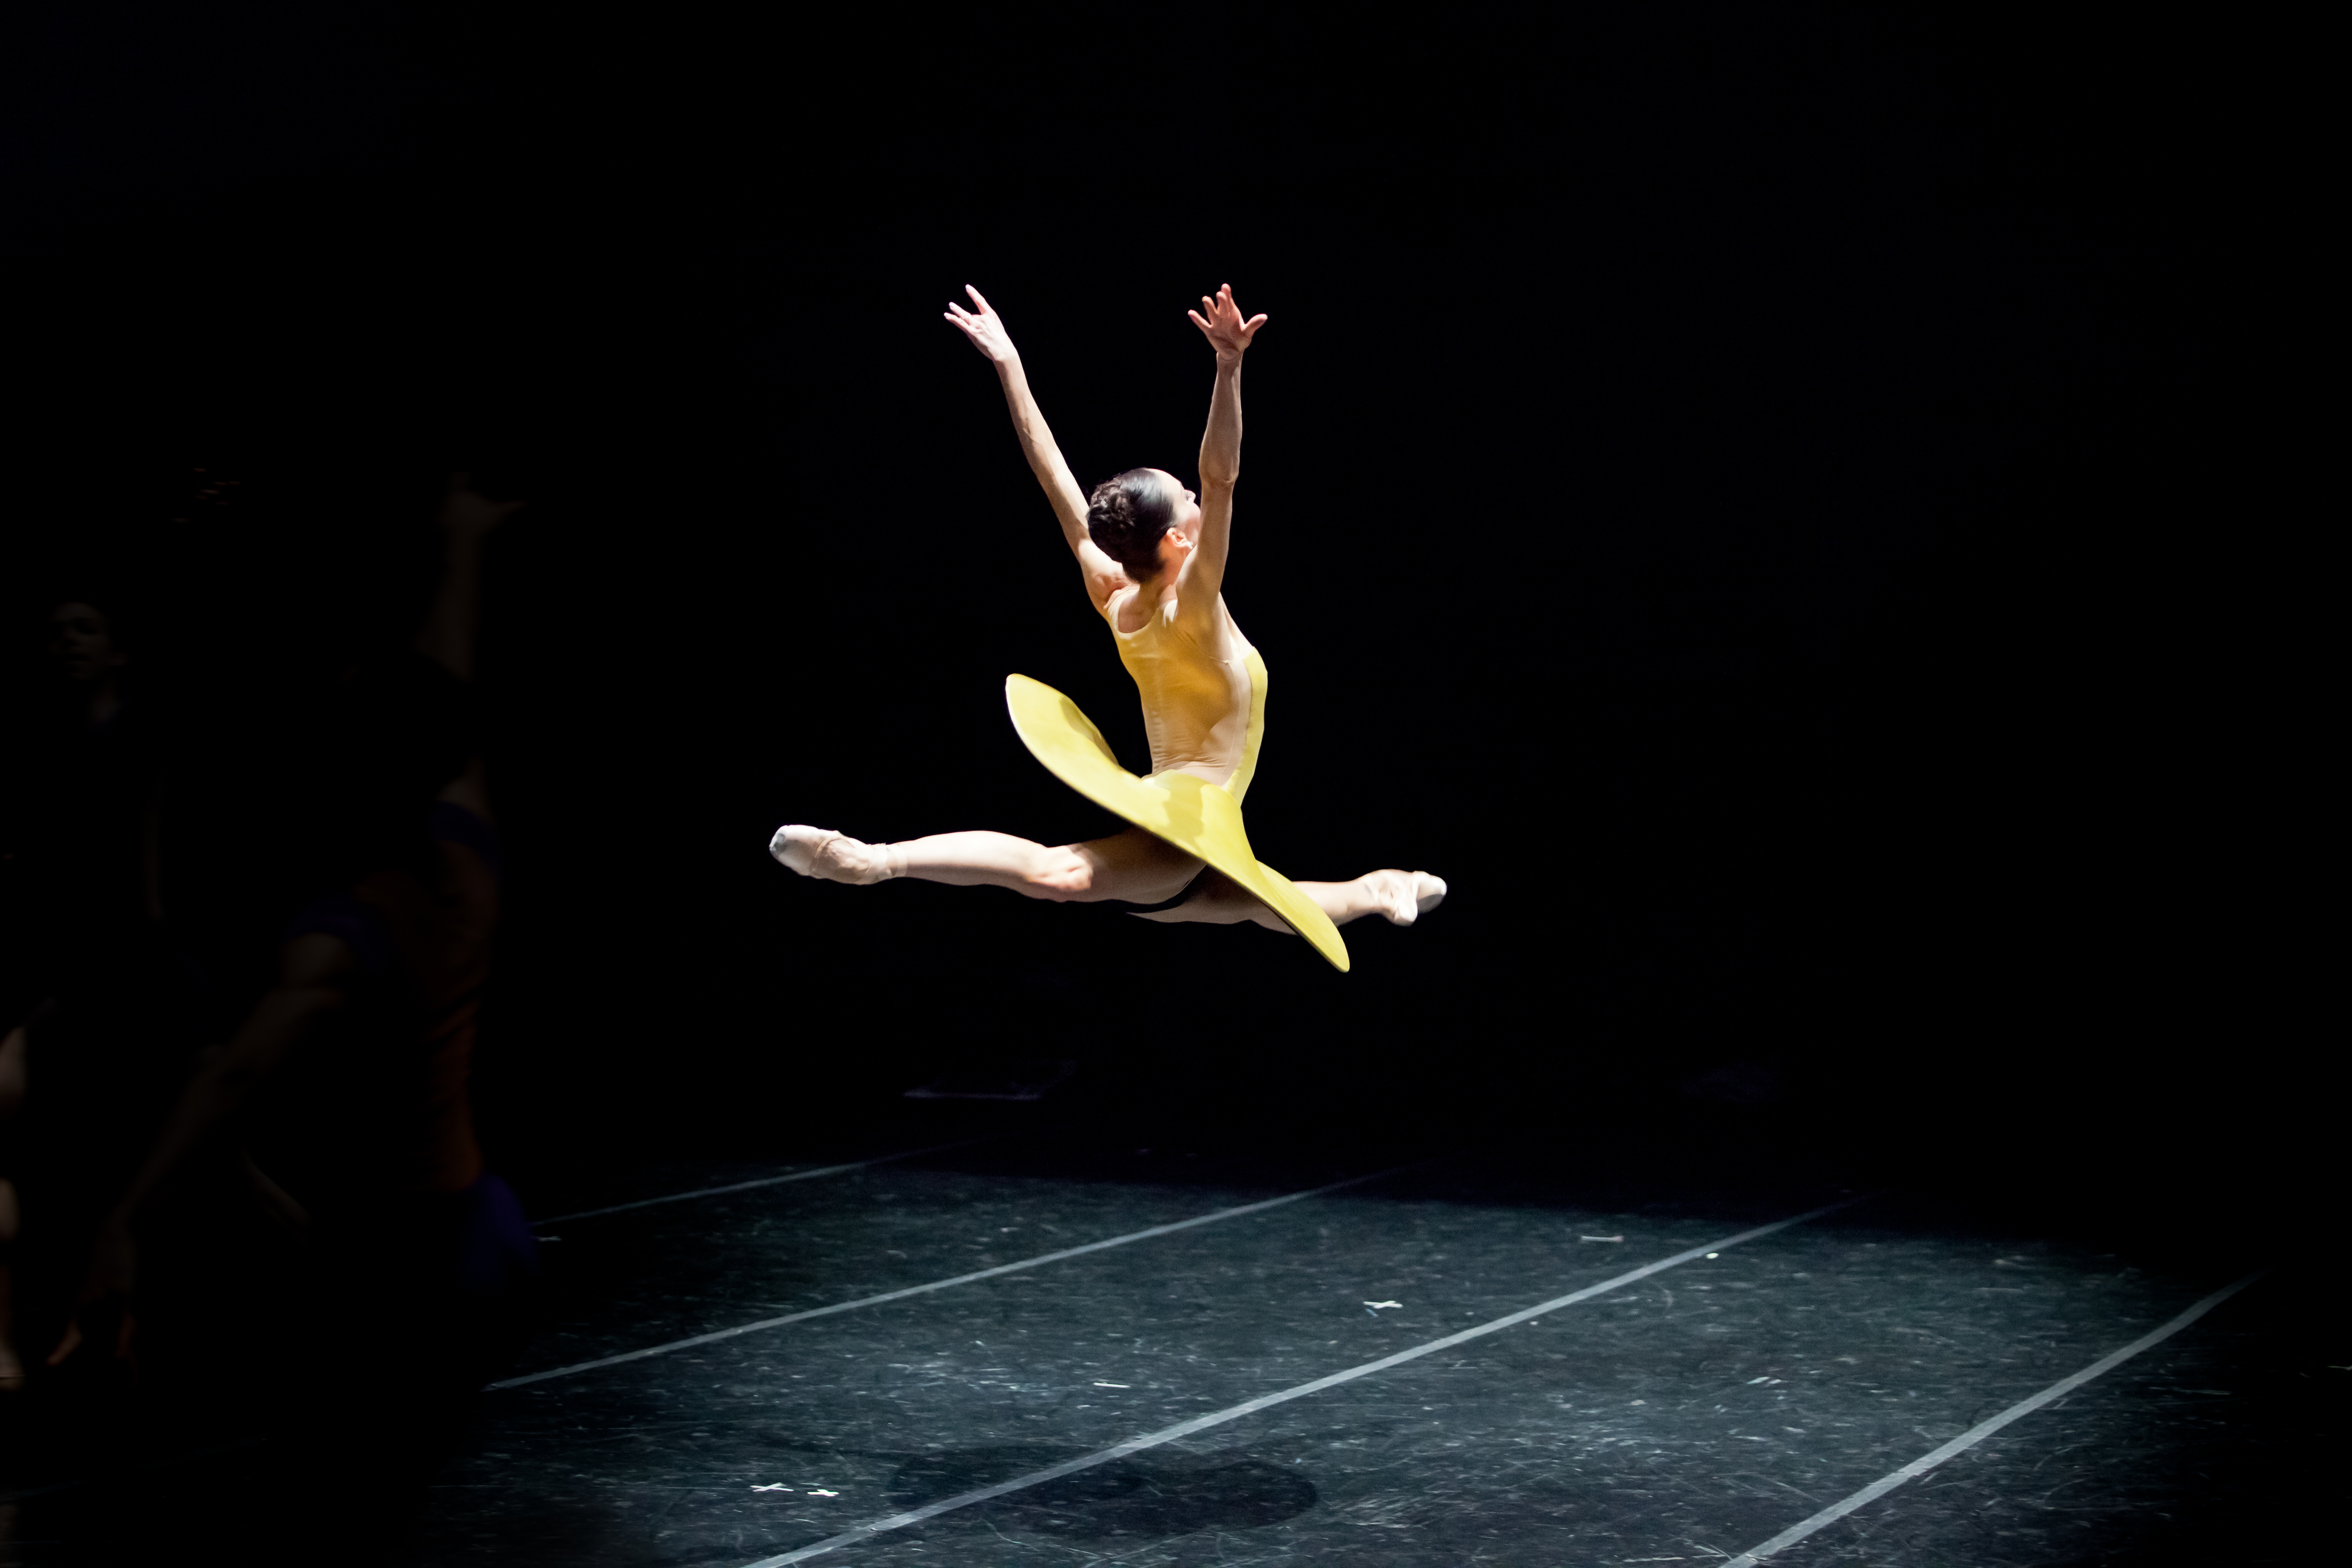 Pennsylvania Ballet Principal Dancer Amy Aldridge in William Forsythe's The Vertiginous Thrill of Exactitude. Photo: Alexander Iziliaev.